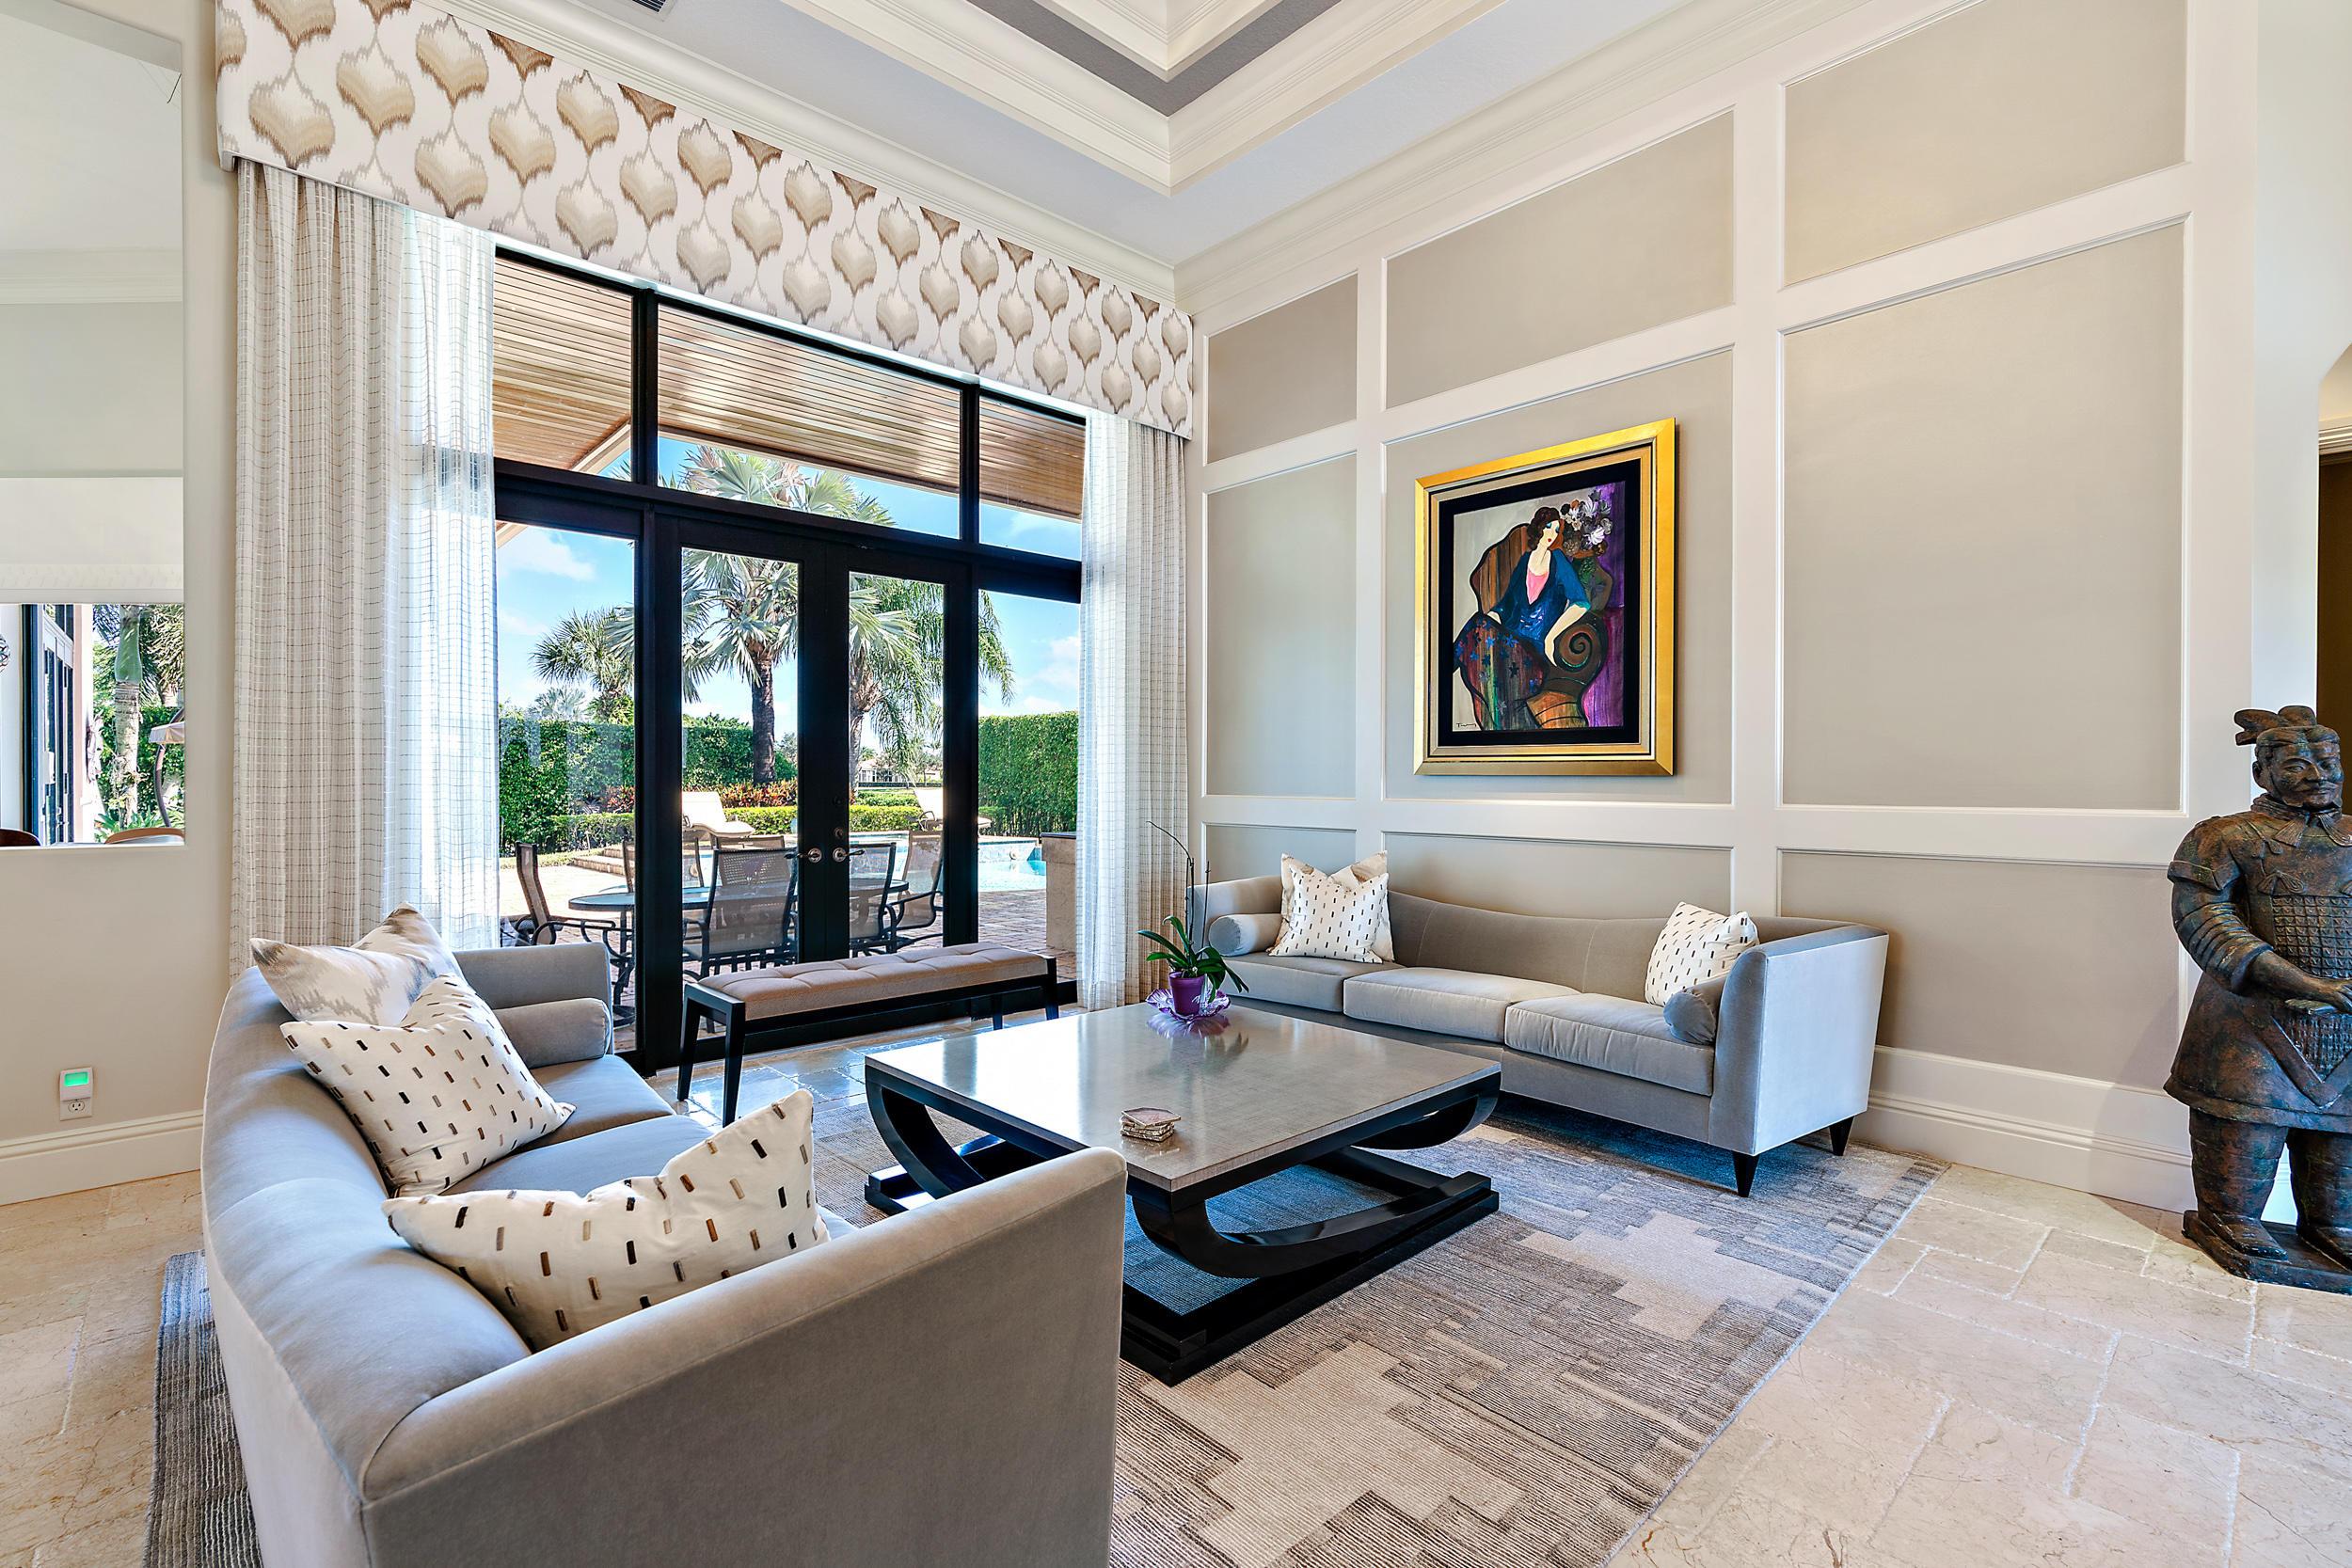 7372 Horizon Drive, West Palm Beach, Florida 33412, 4 Bedrooms Bedrooms, ,4 BathroomsBathrooms,Residential,For Sale,Horizon,RX-10572880